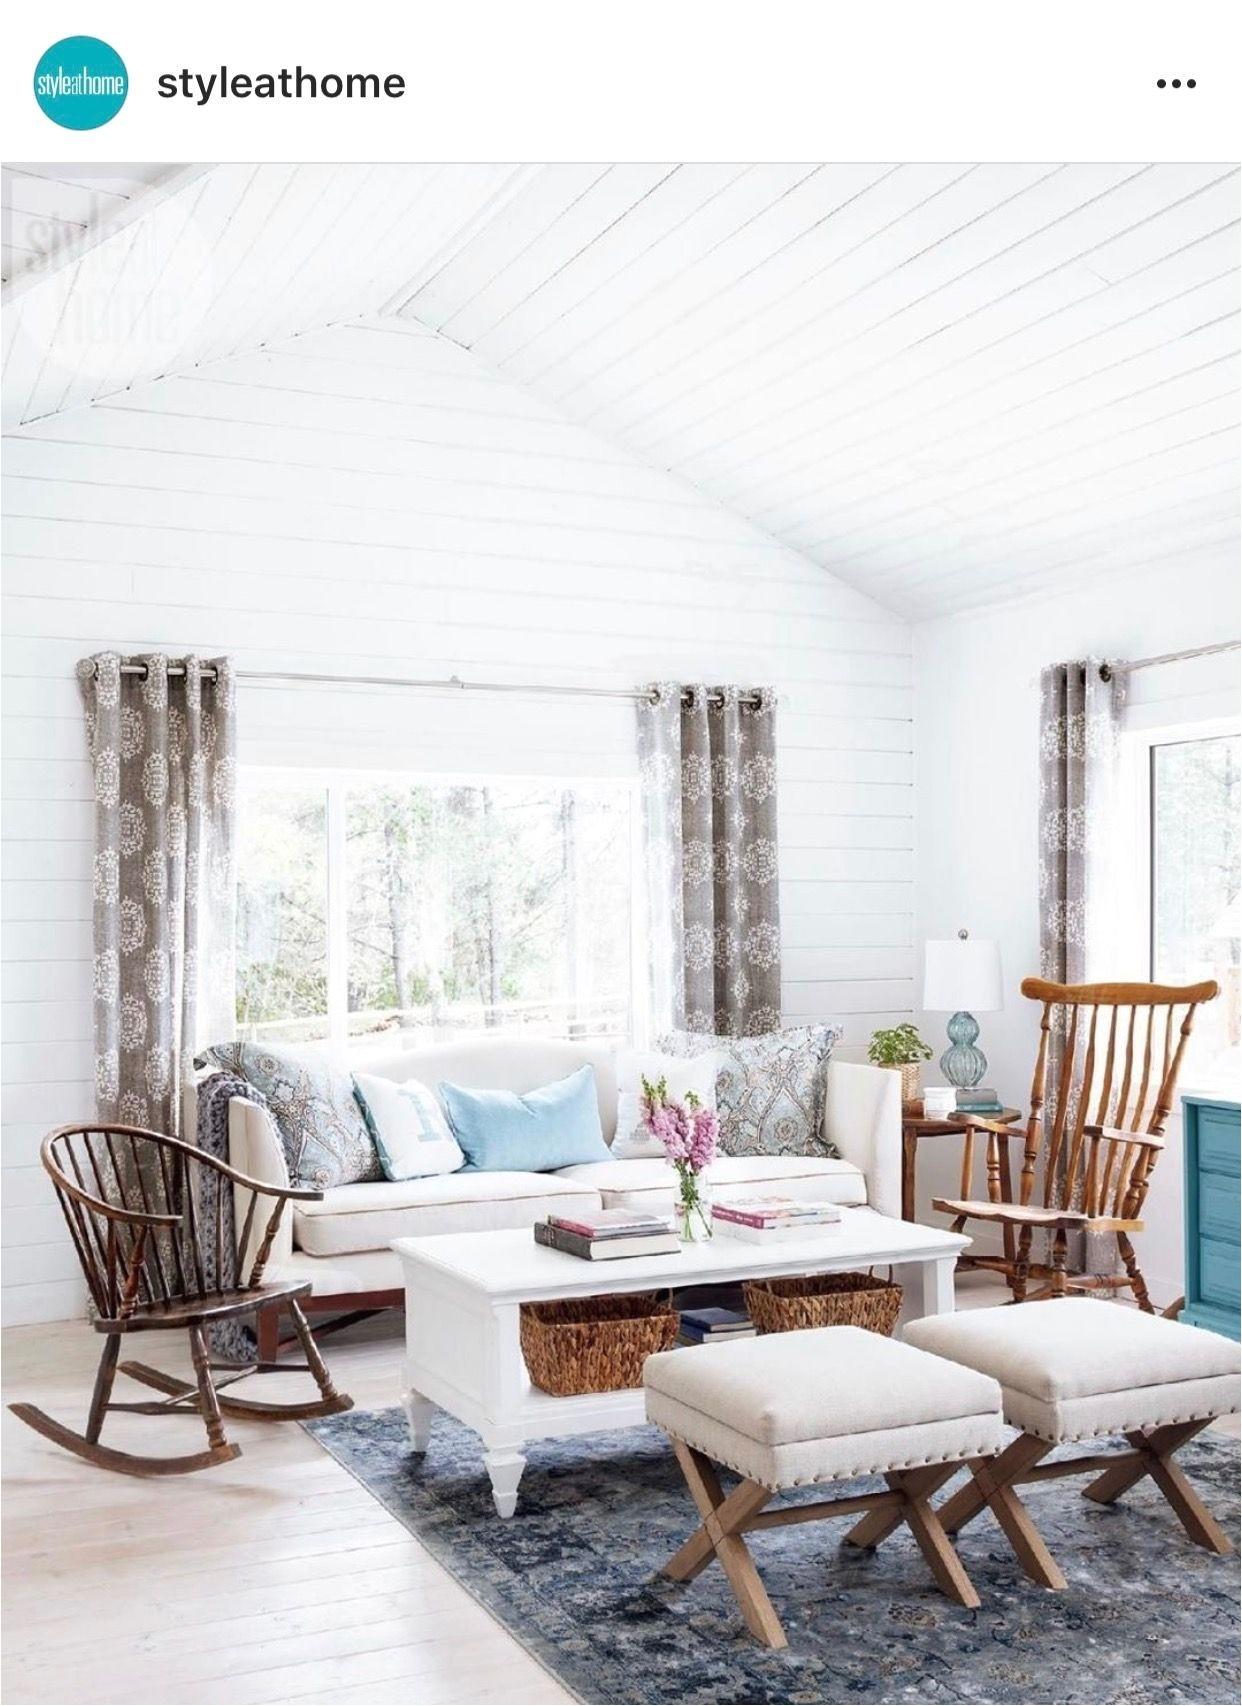 "Cabin Living Room Decor Save Pin Od Pou…¾vate""¾a Kim Na Nástenke Cabin Living Room Design"